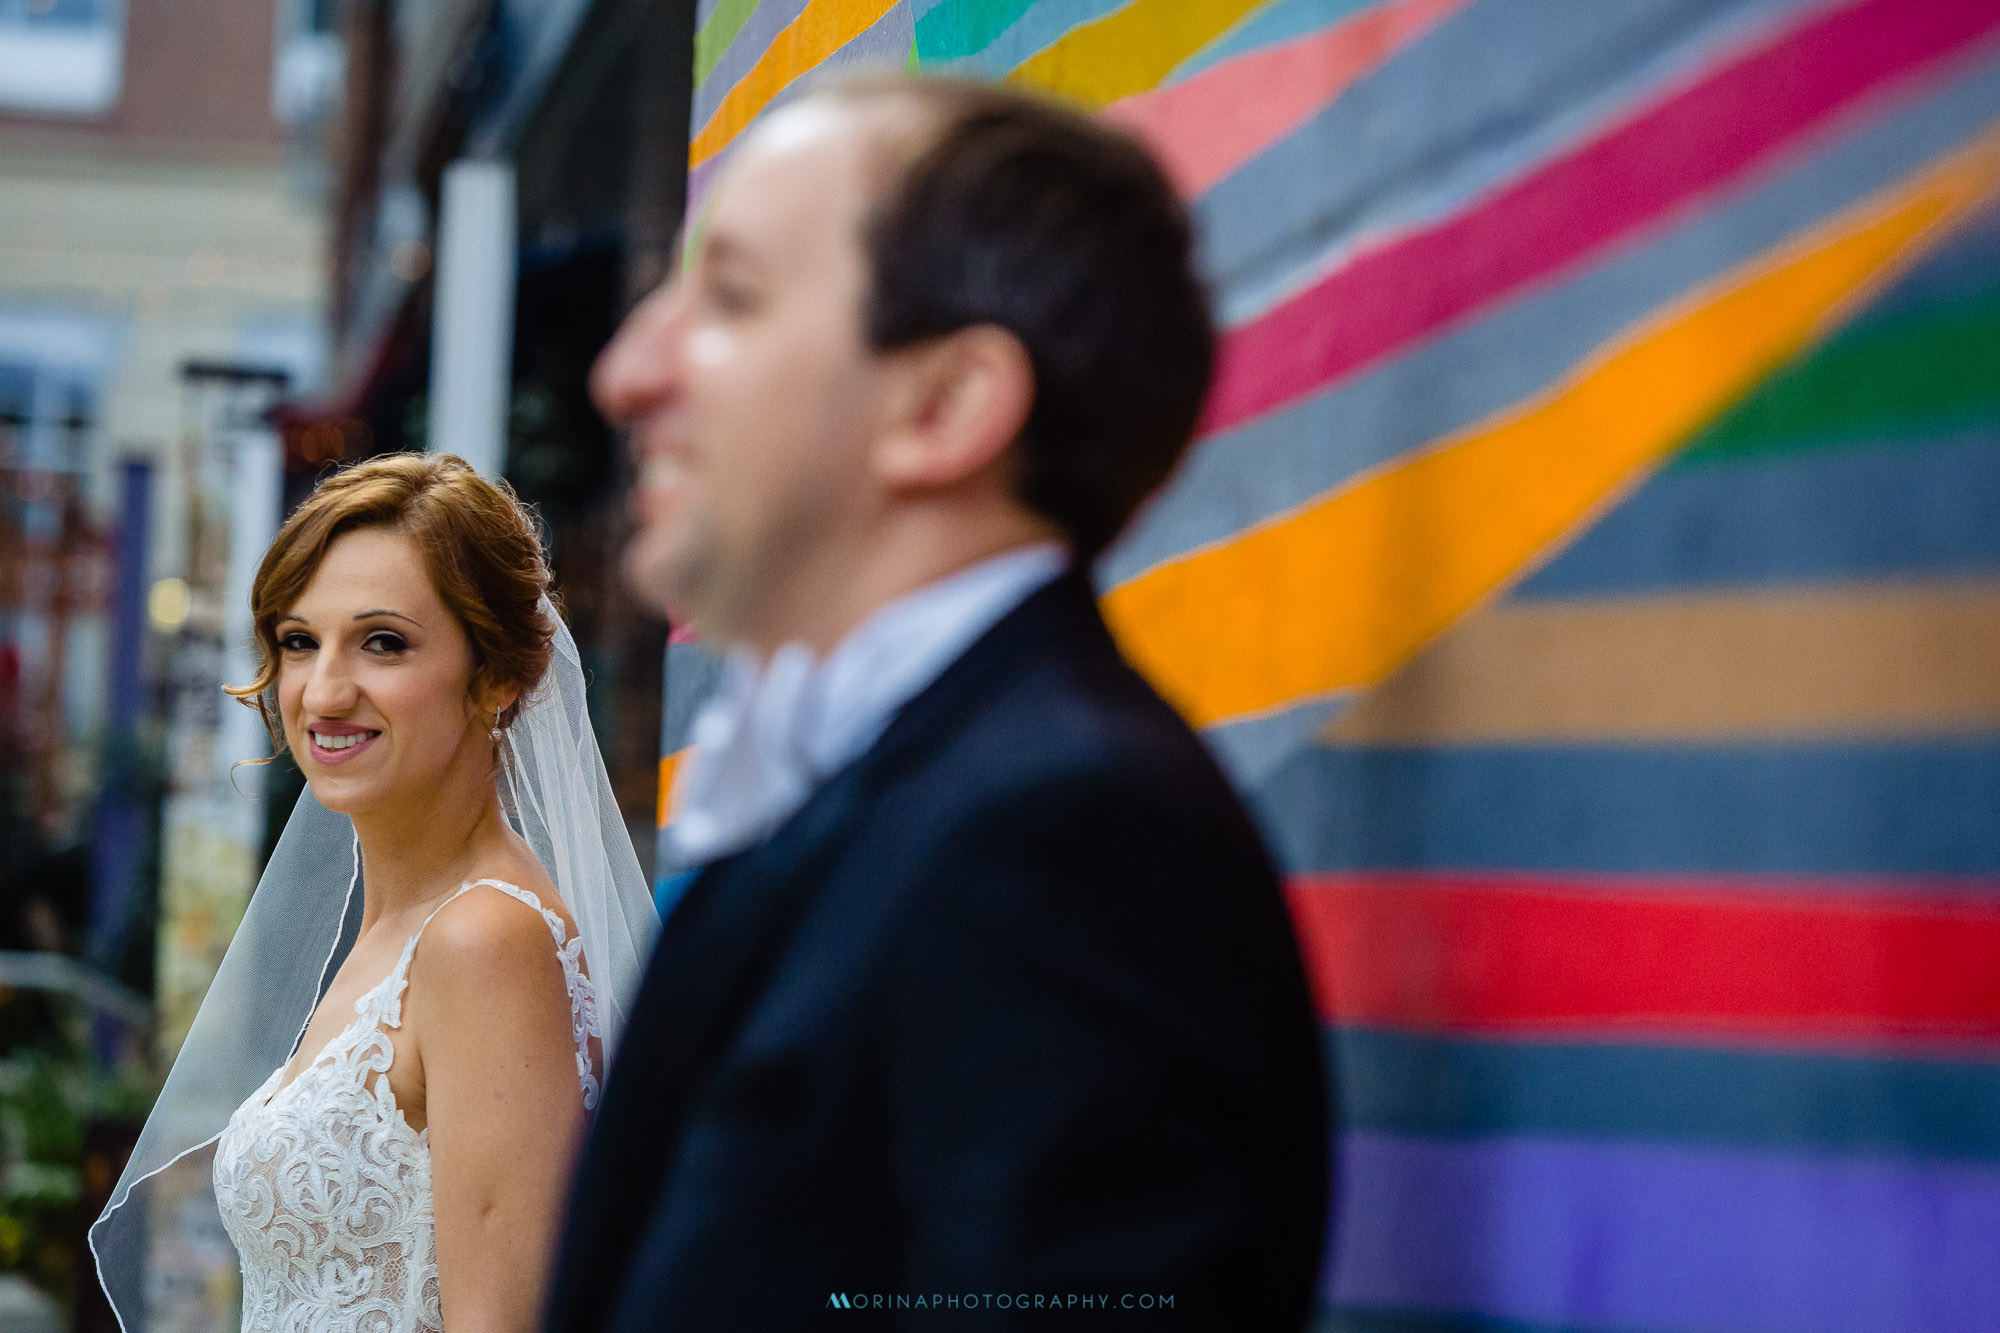 Ilhana & Jonathan Wedding at Vault 634 - Allentown 0040.jpg